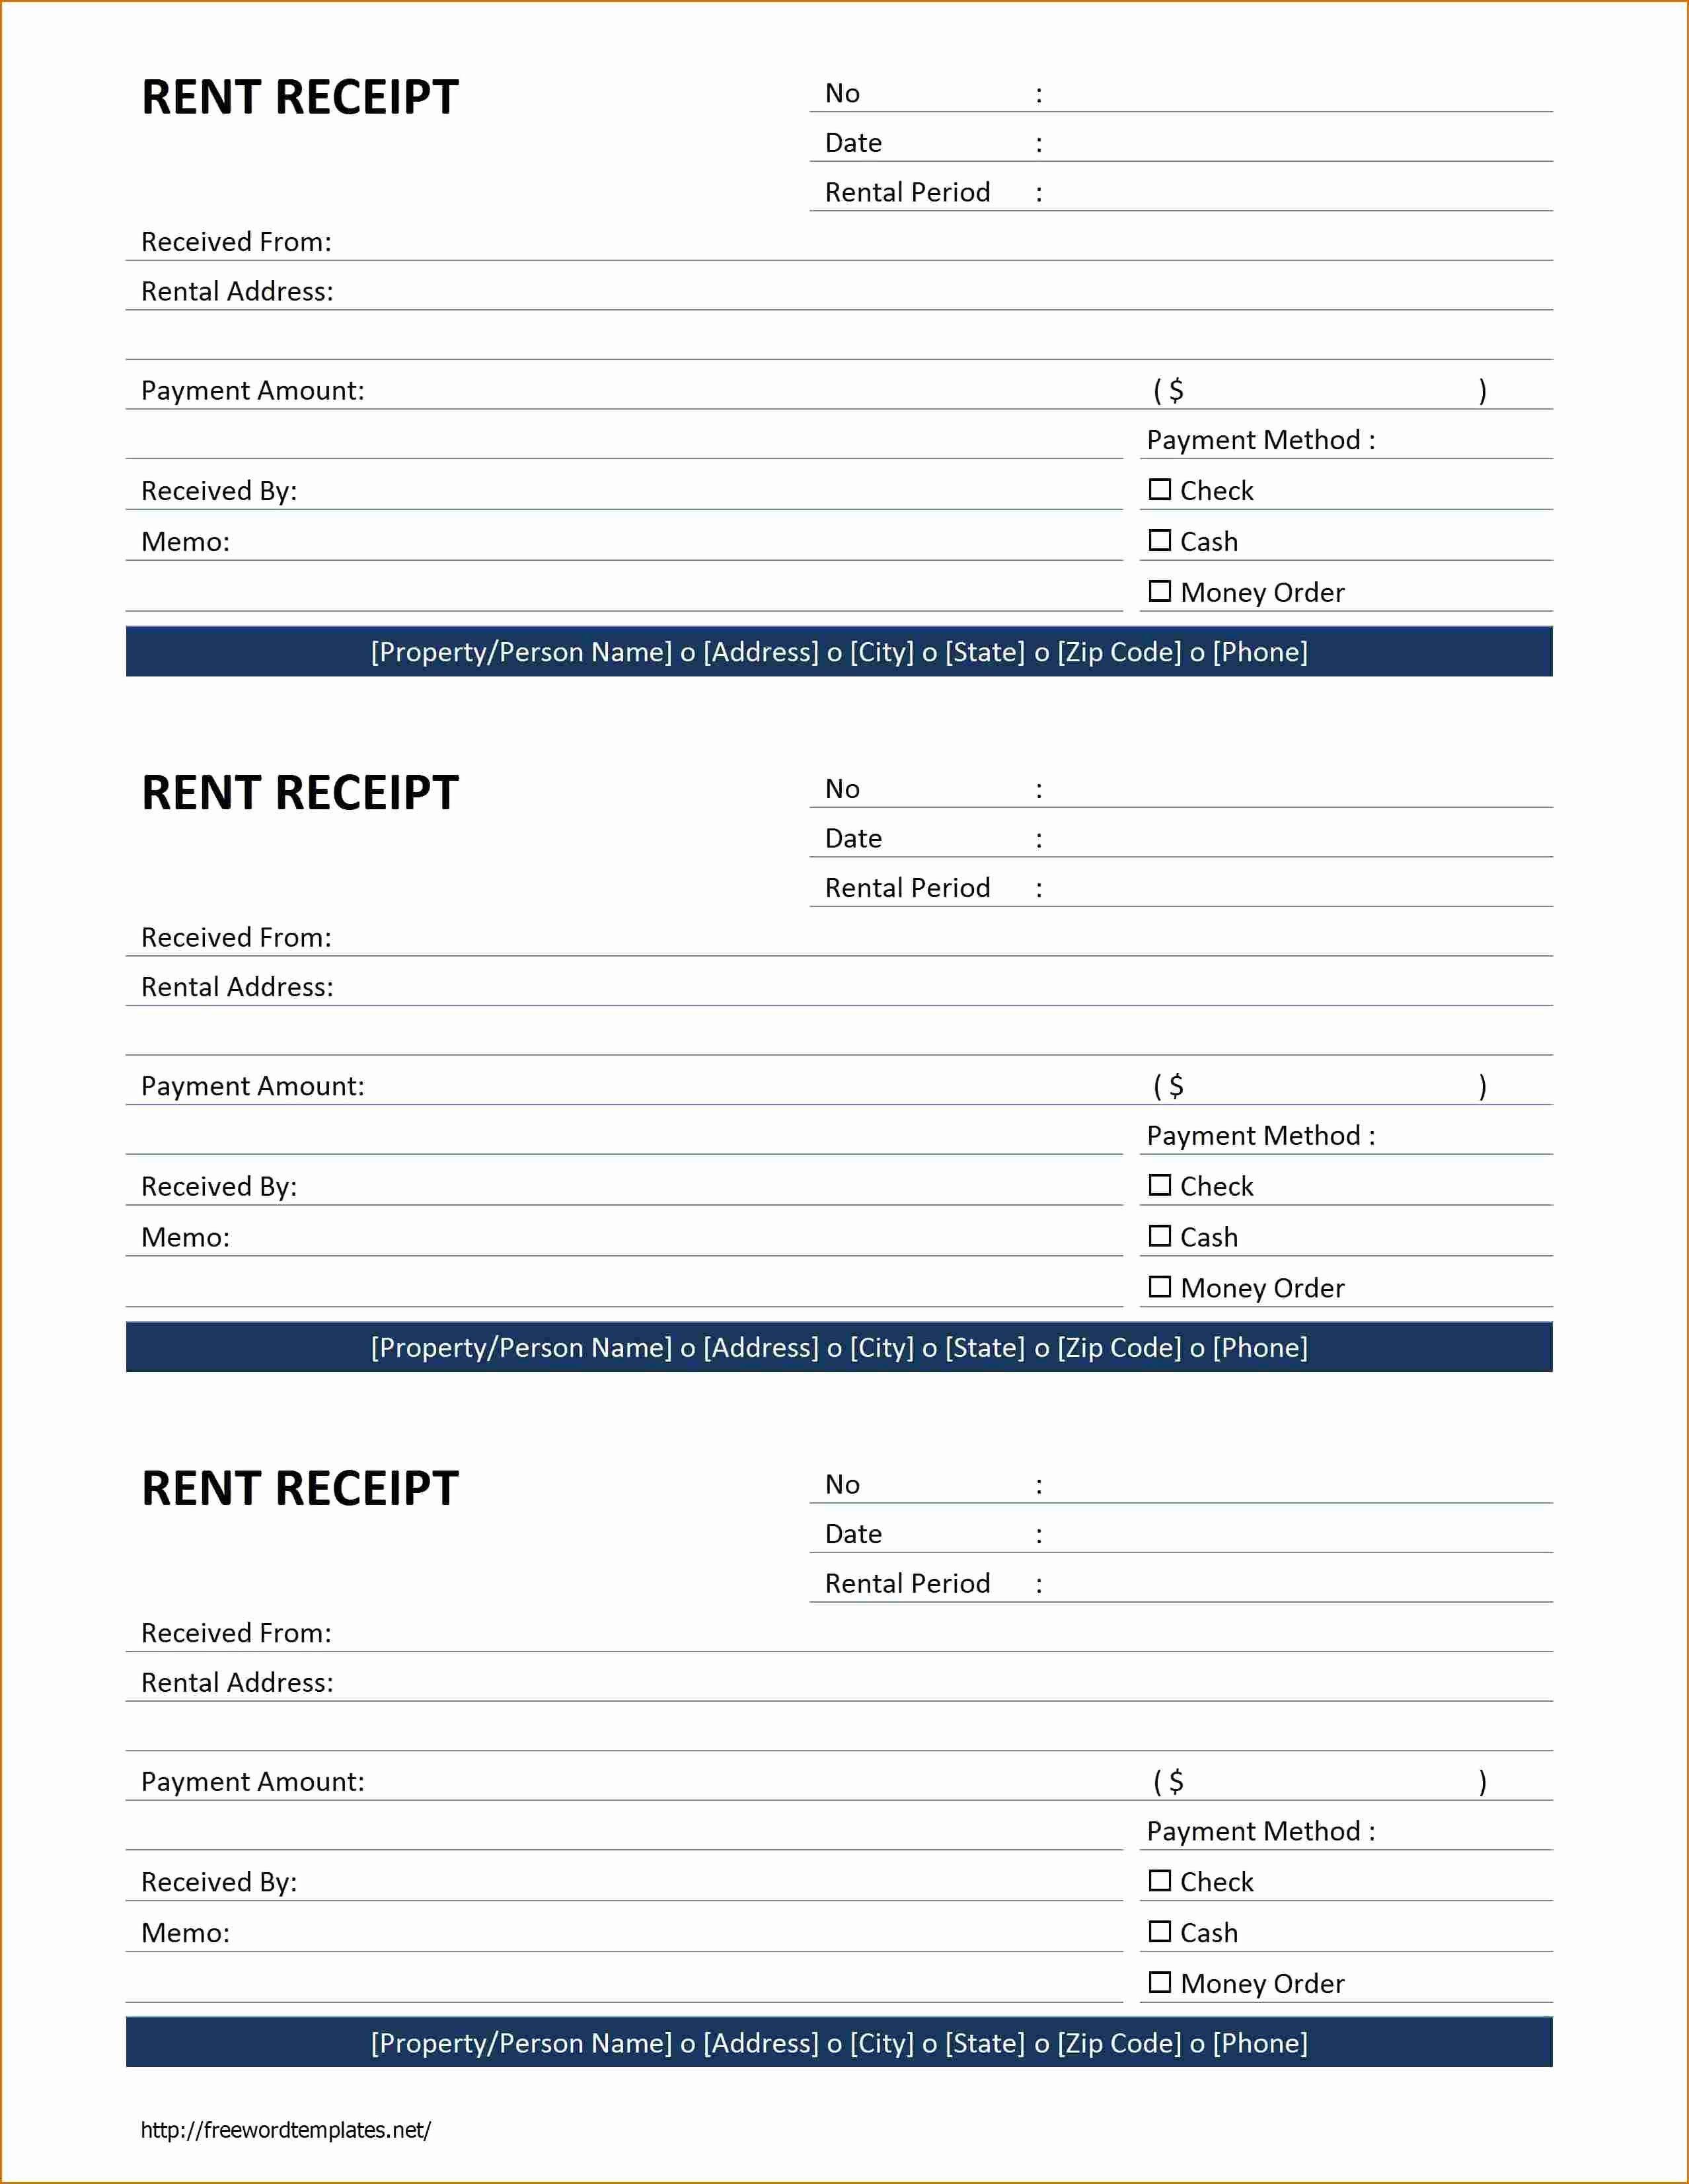 Free Rent Receipt Template Word Inspirational 6 Rent Receipt Template Word